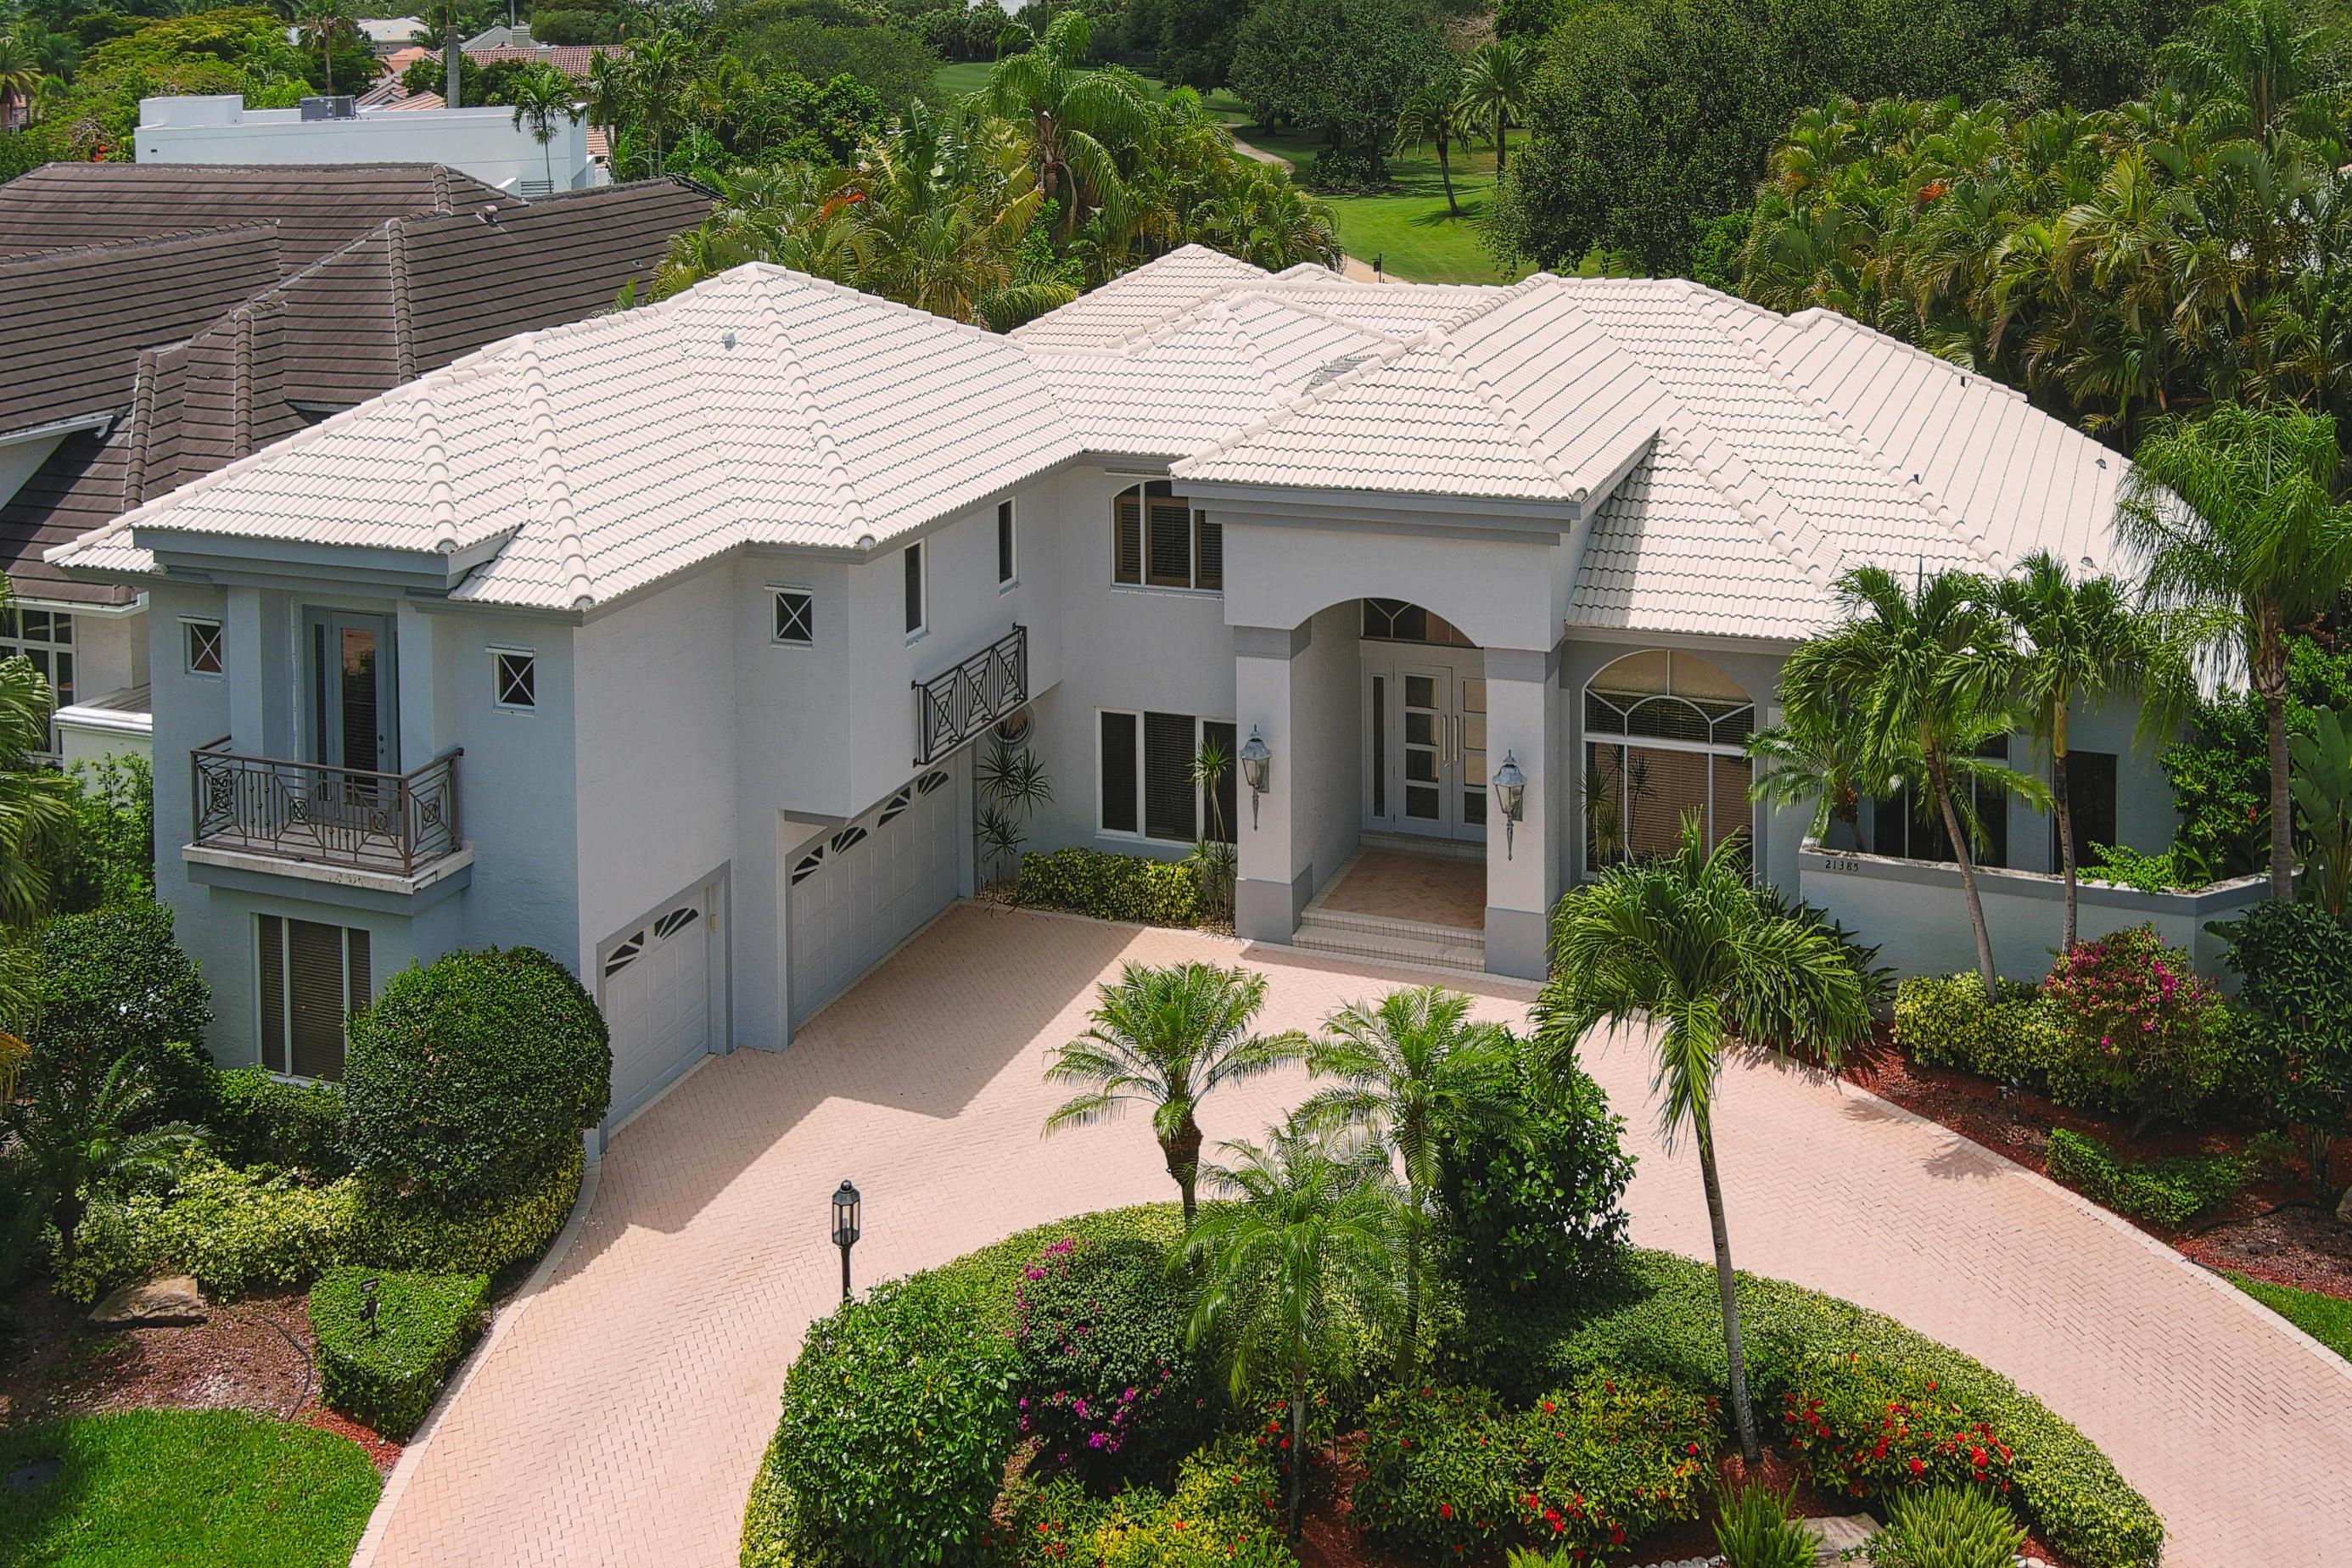 Photo of 21385 Greenwood Court, Boca Raton, FL 33433